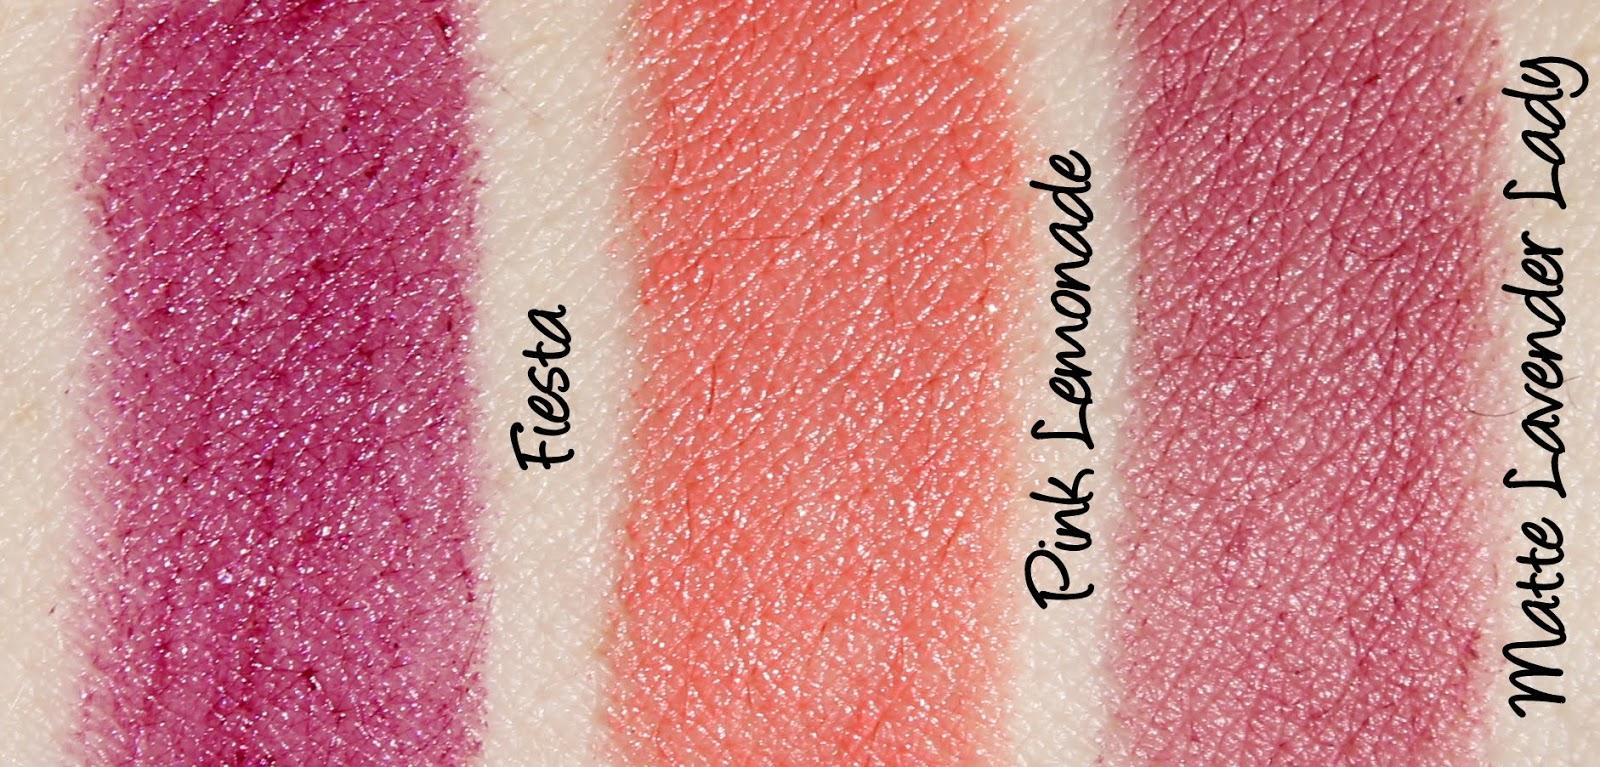 Jordana Lipsticks - Matte Lavender Lady, Fiesta and Pink Lemonade Swatches & Review